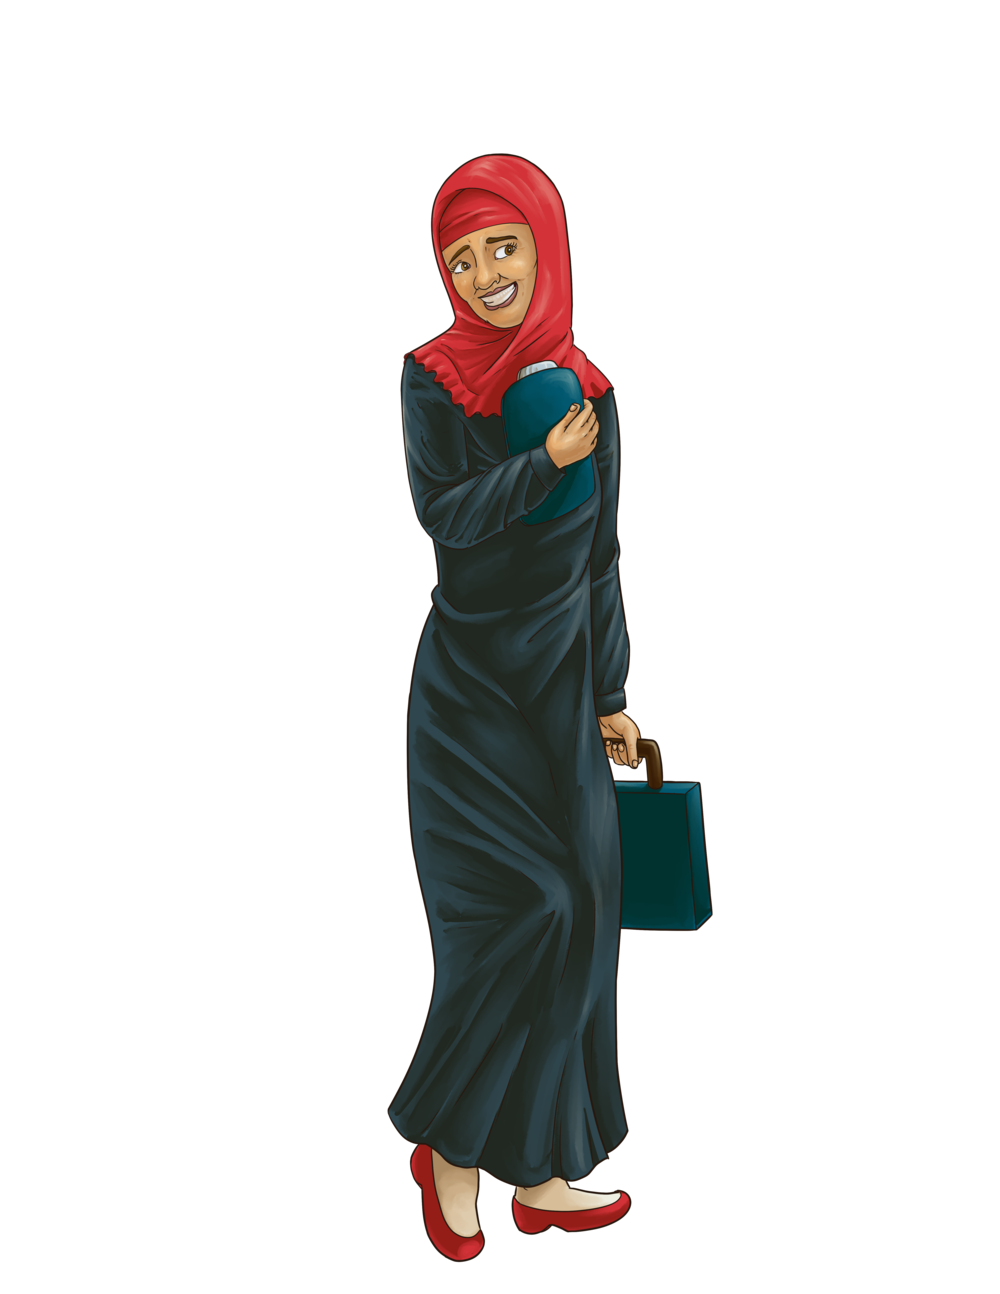 02-Shy Muslim Woman.png